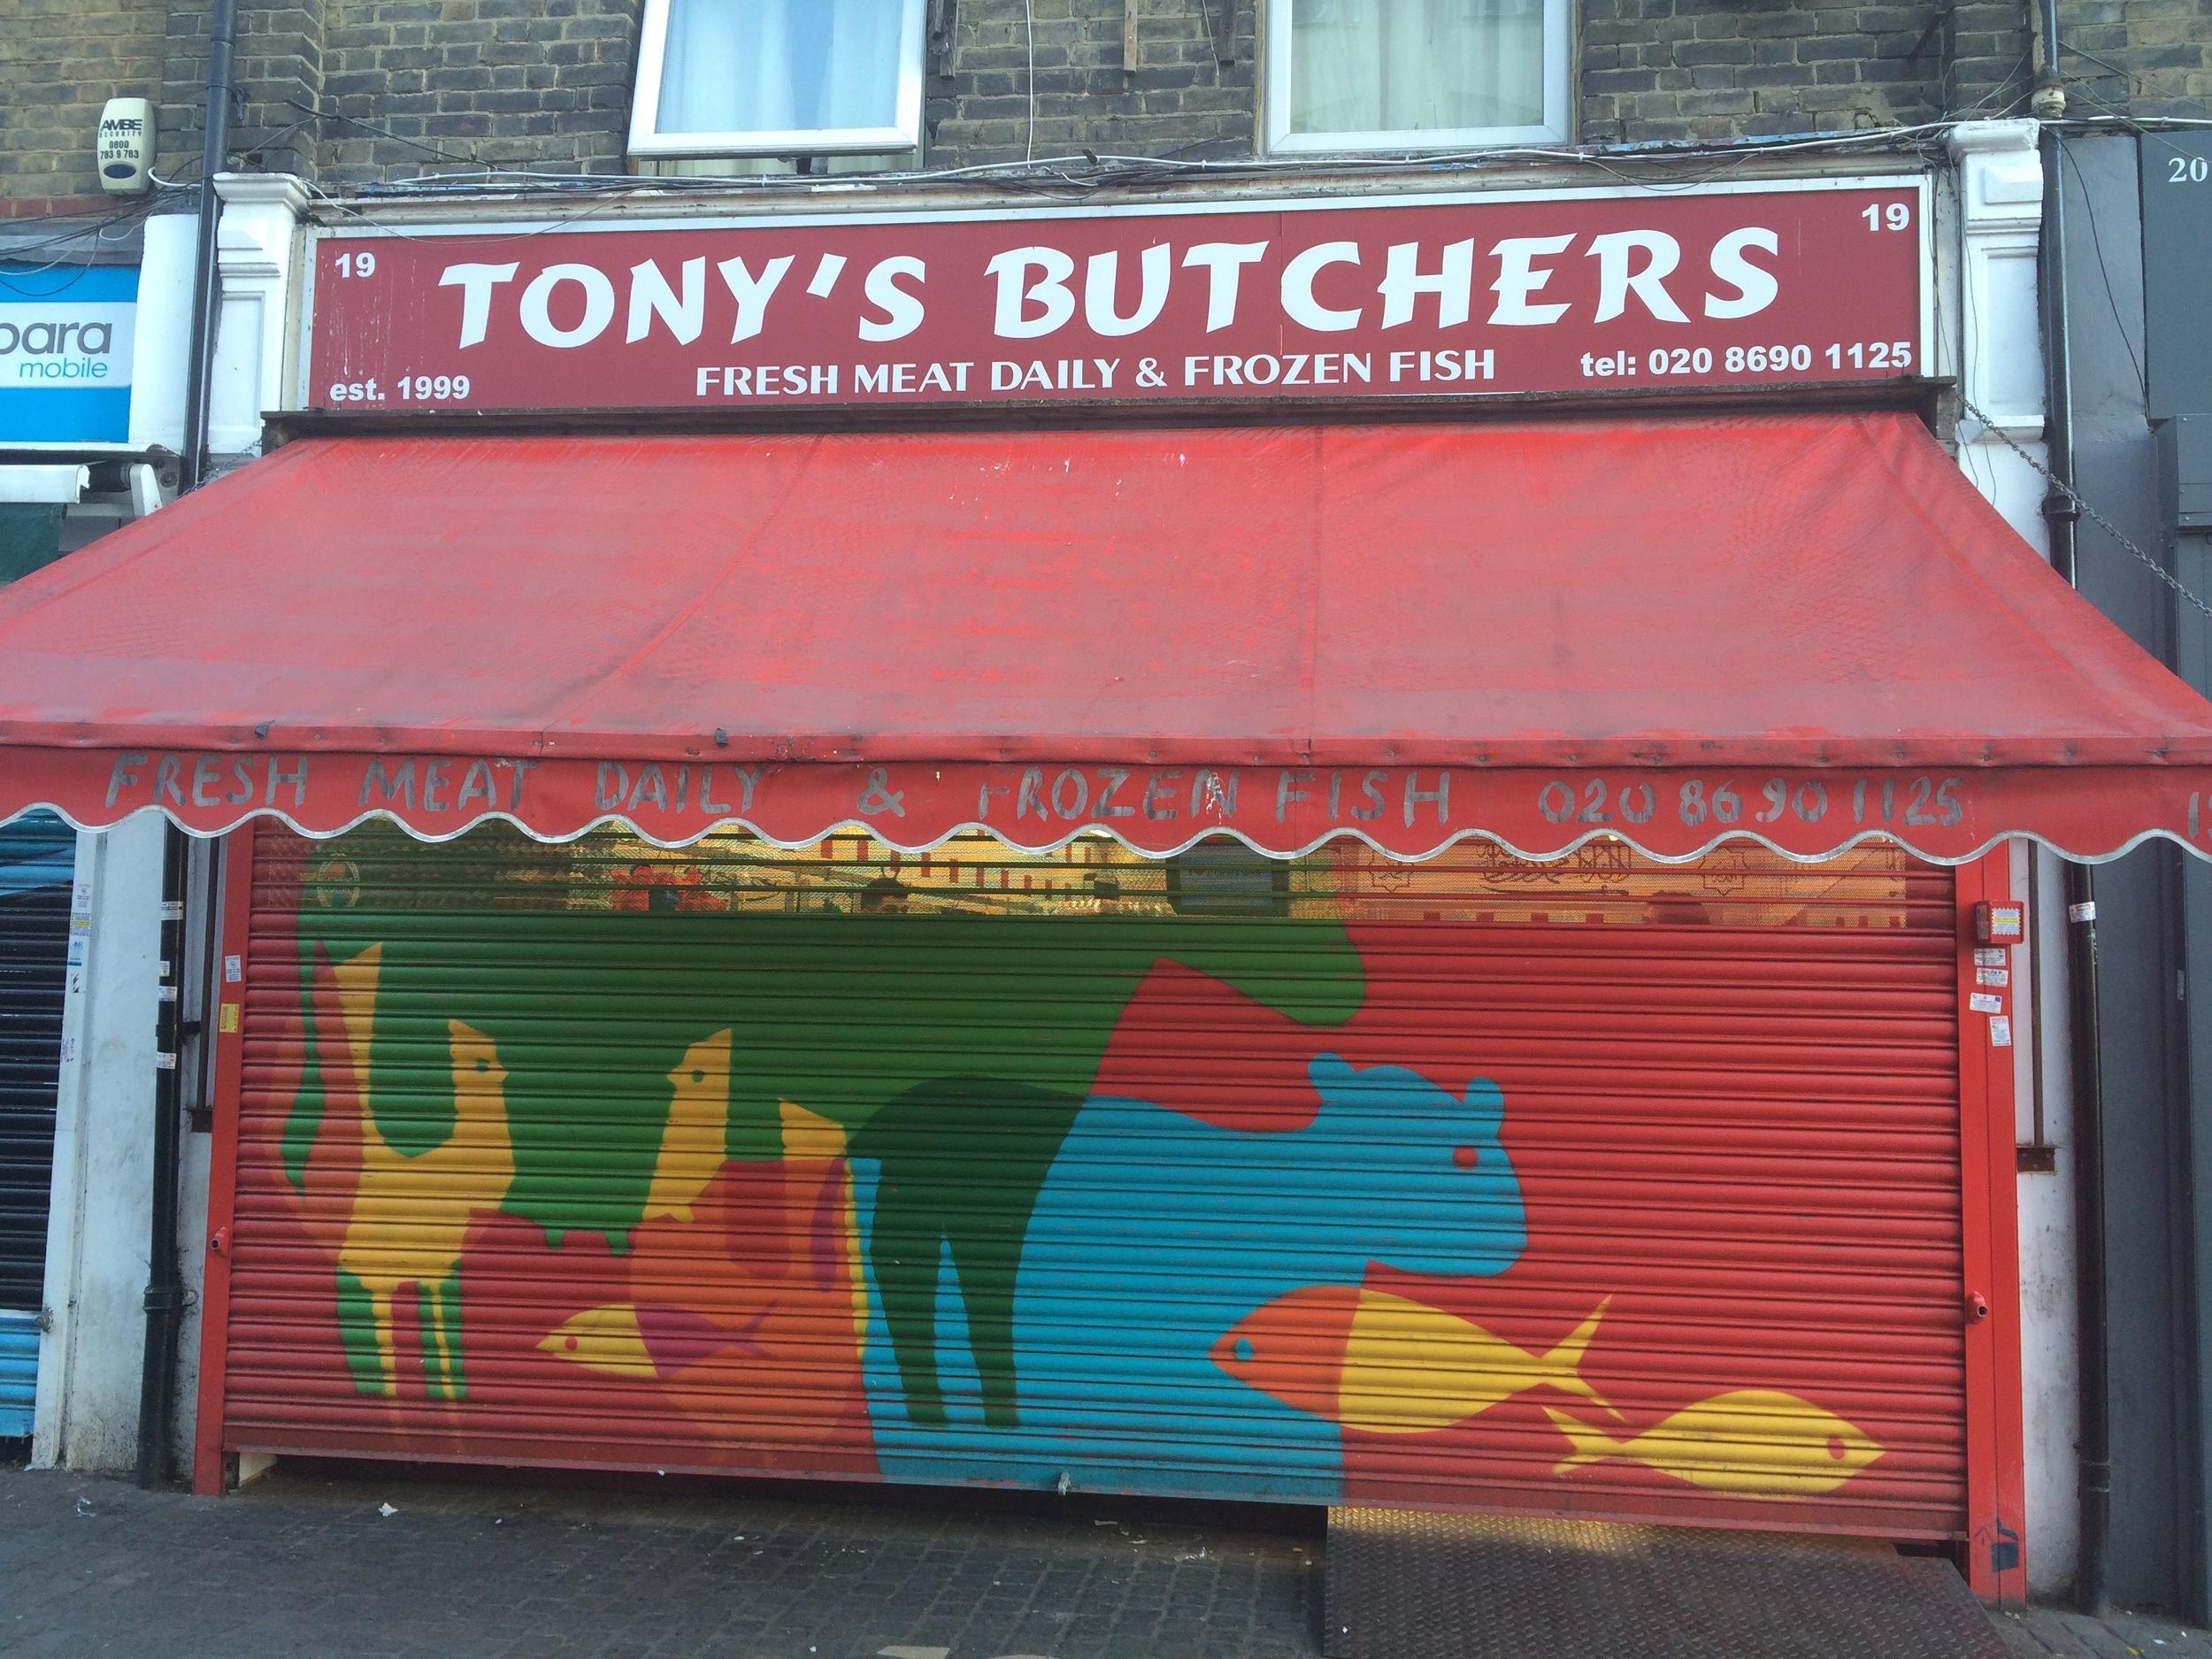 Tony's Butchers